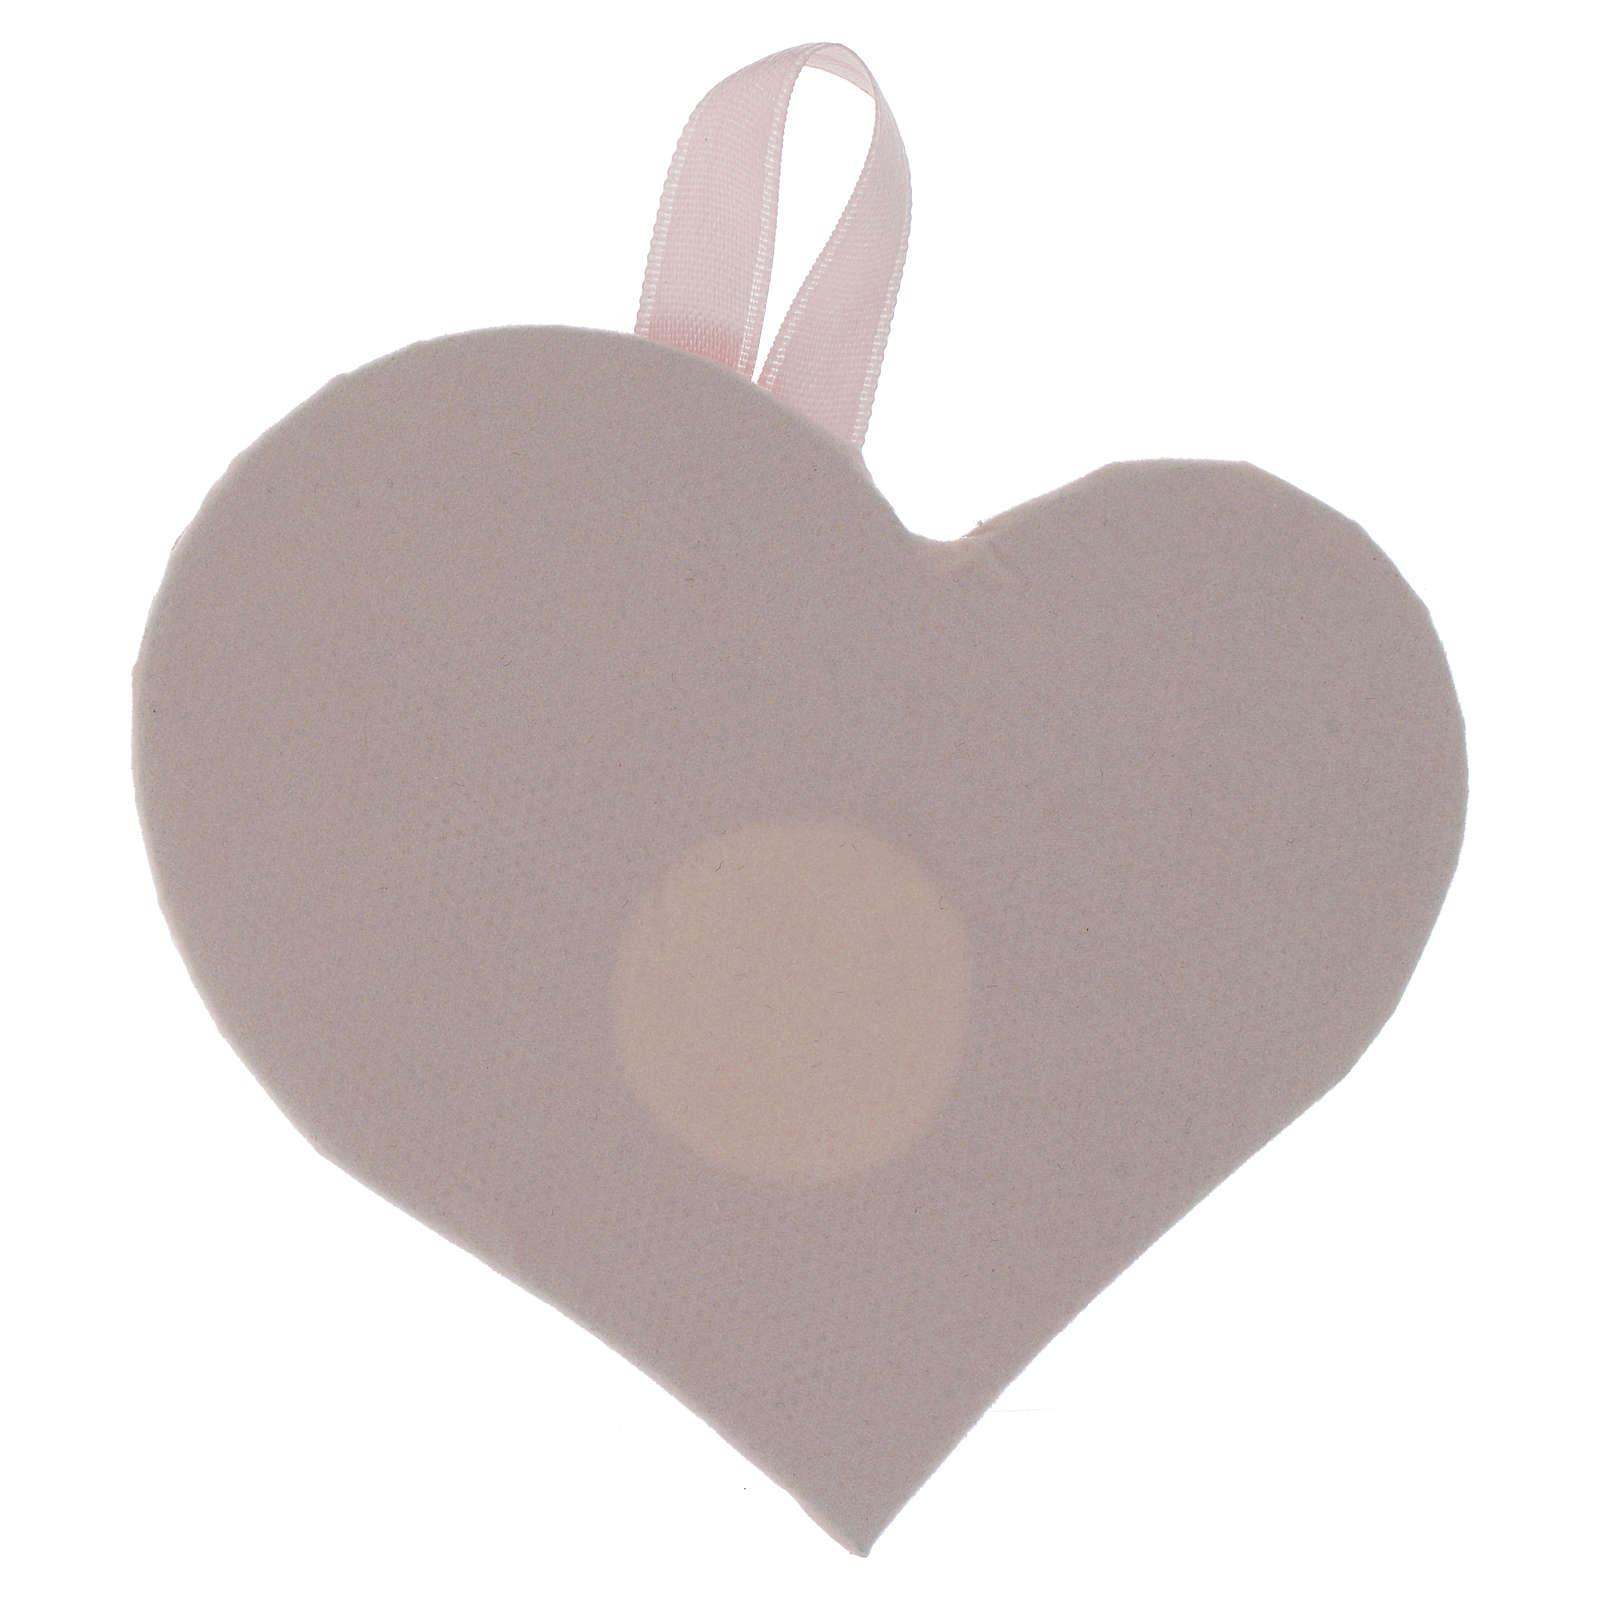 Sopraculla cuore placca Argento angelo custode Carillon rosa 4